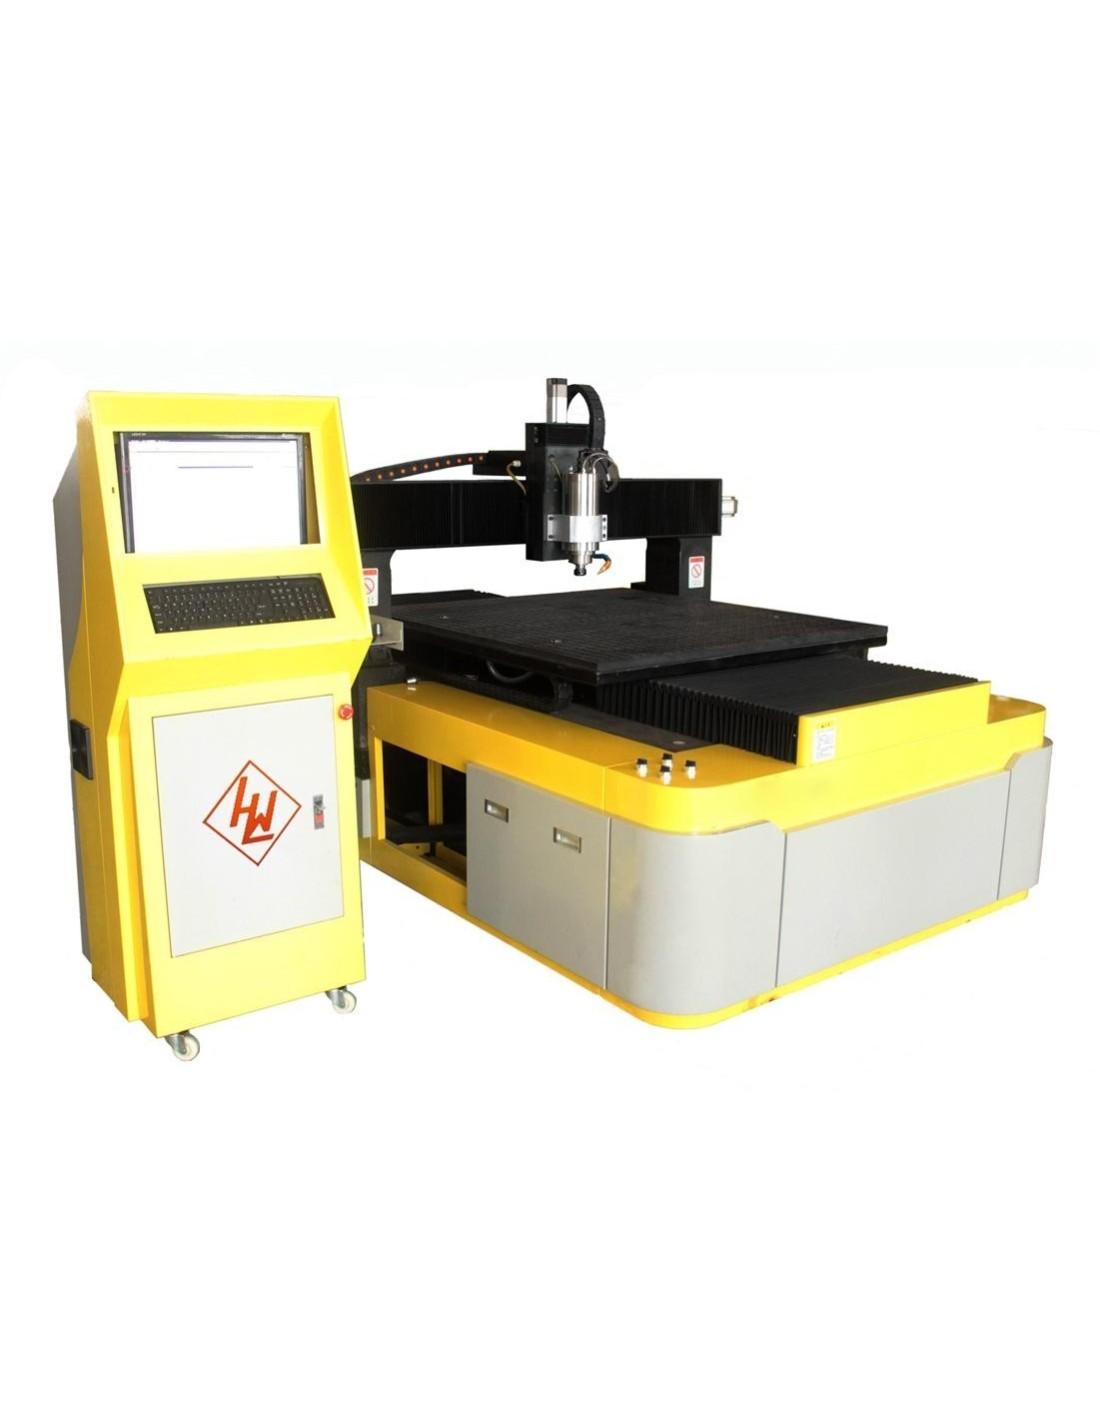 Masina de frezat si gravat CNC Winter HP 1313 High Precision